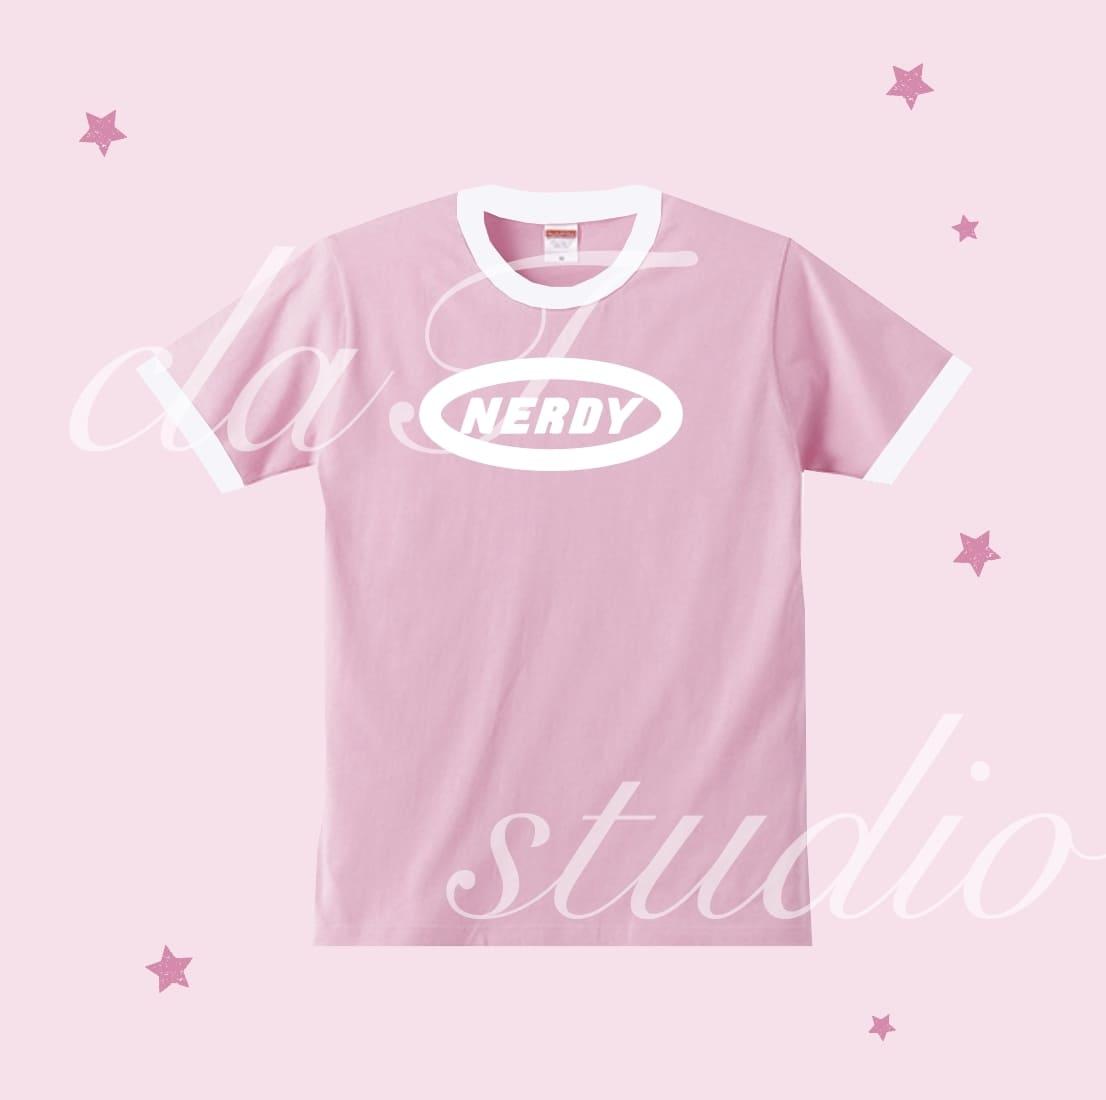 NERDY_image_0003